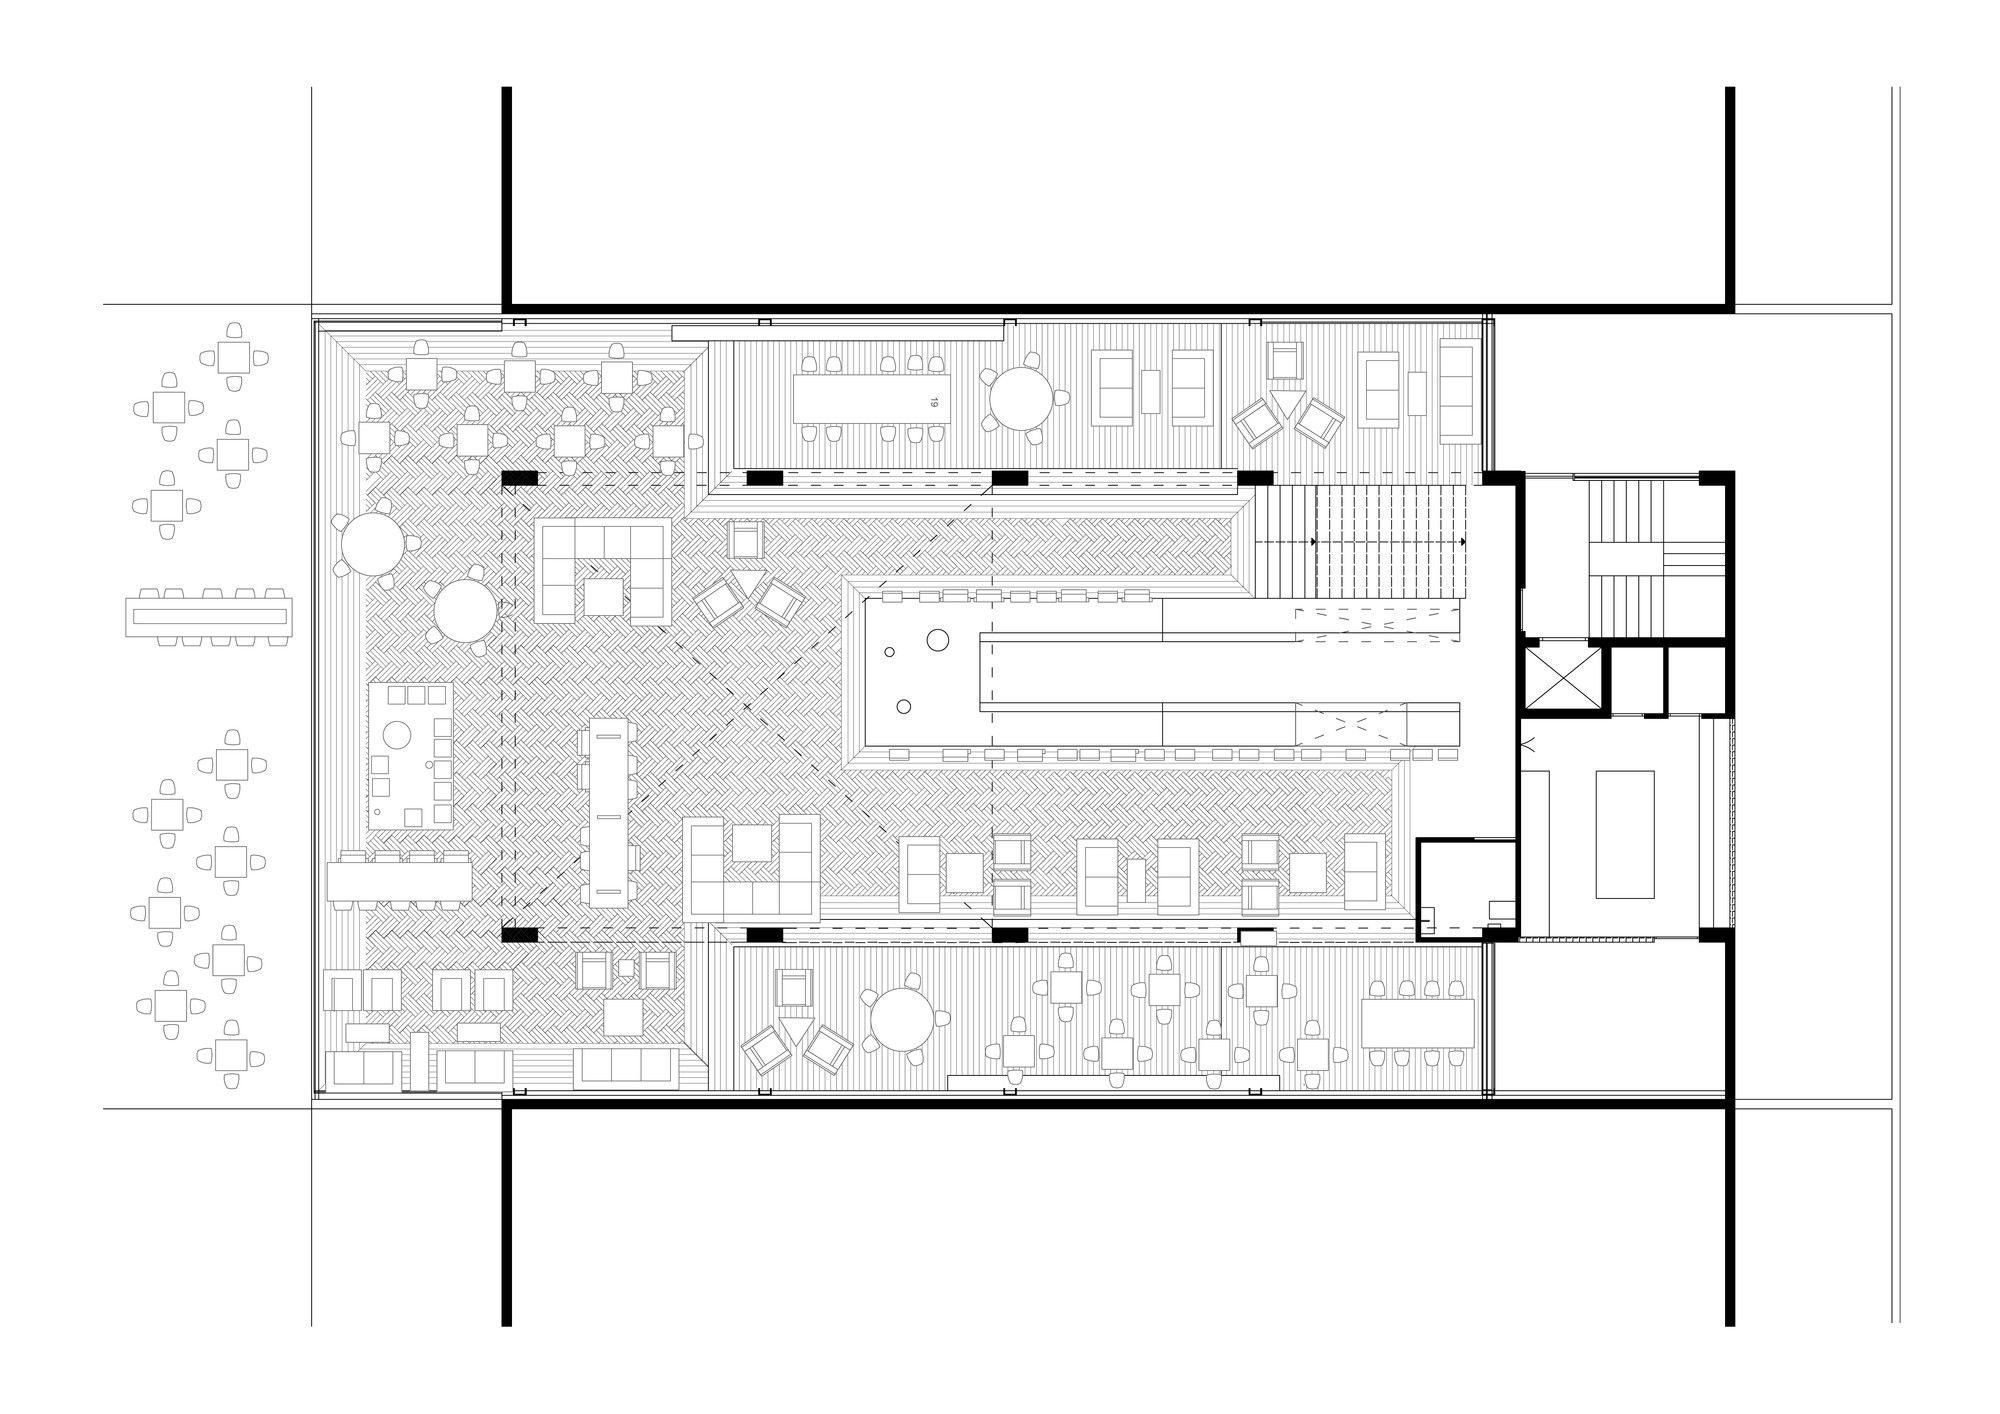 gallery of coffee shop 314 architecture studio 10 coffee gallery of coffee shop 314 architecture studio 10